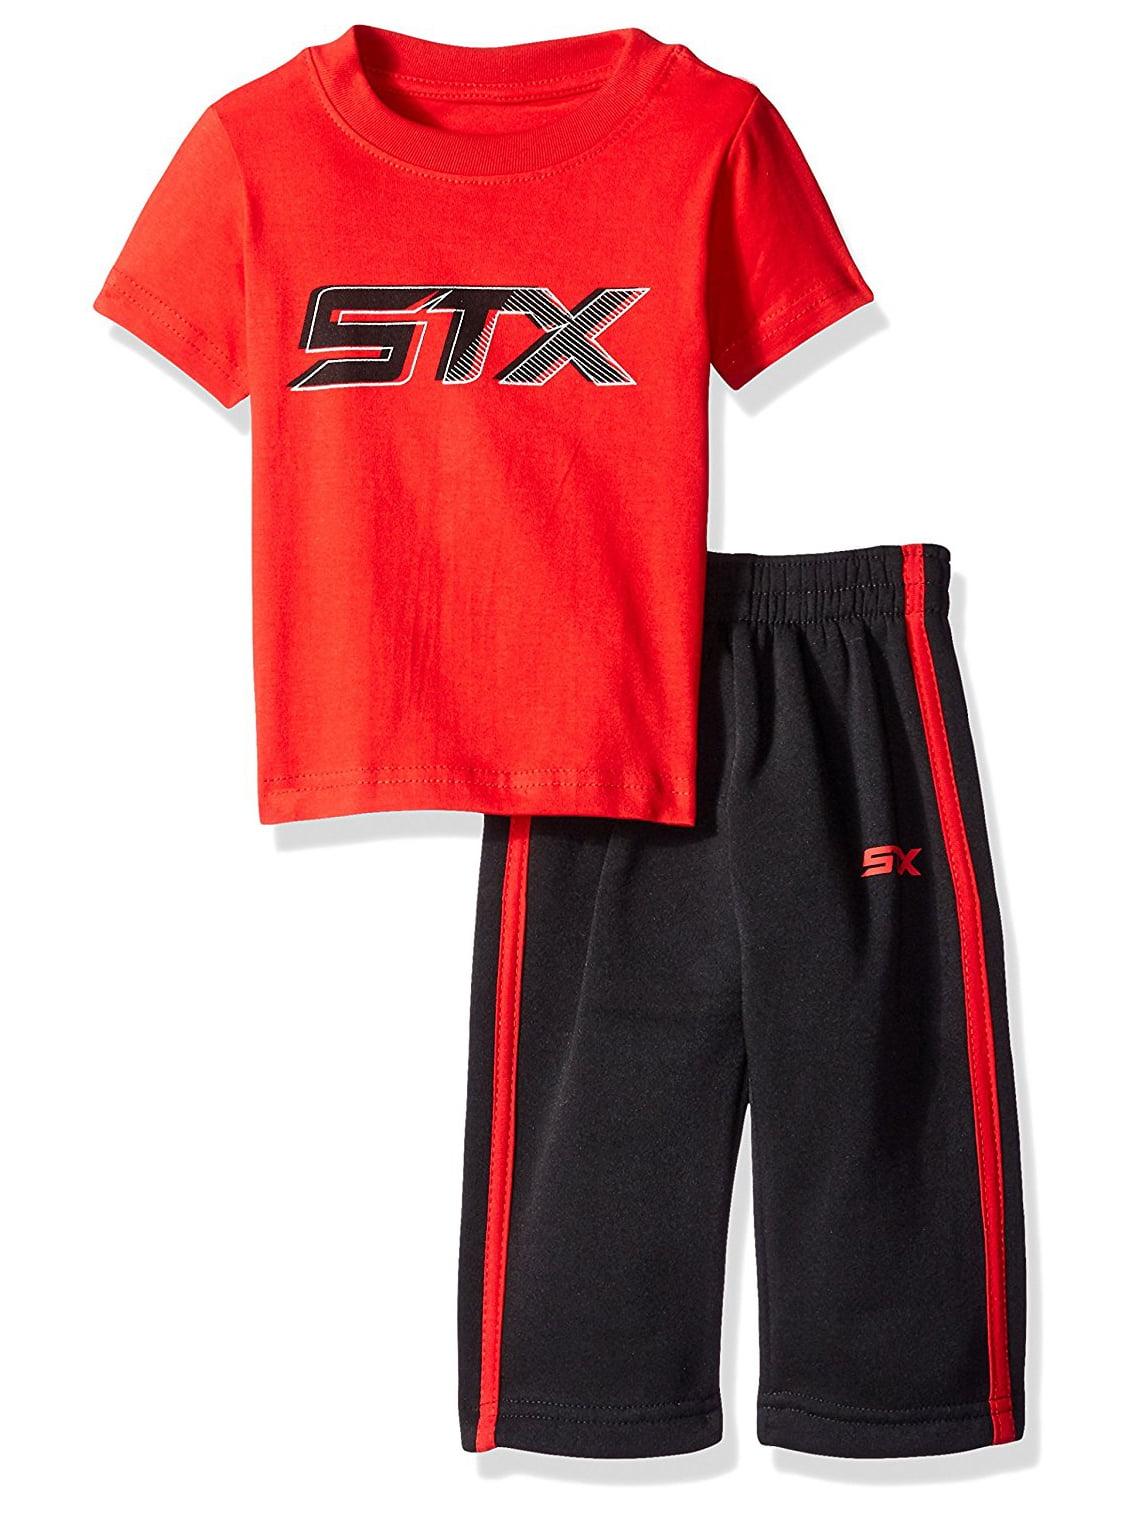 Active Performance T-Shirt and Fleece Pant, 2-Piece Set (Little Boys)